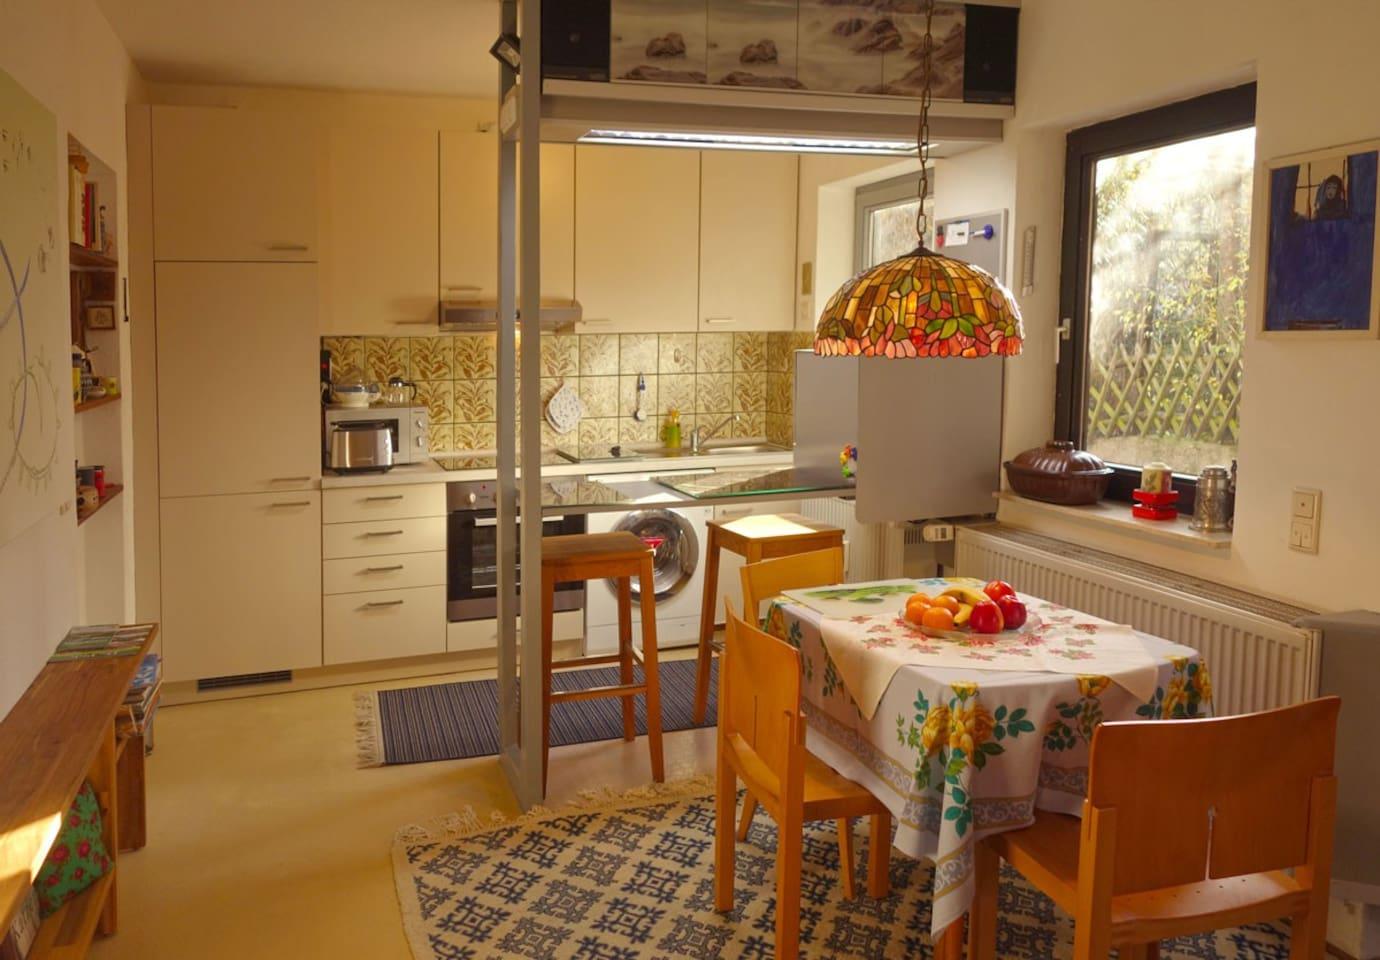 apARTment - gute Wohngegend - optimal für 1 Person - Apartments for ...